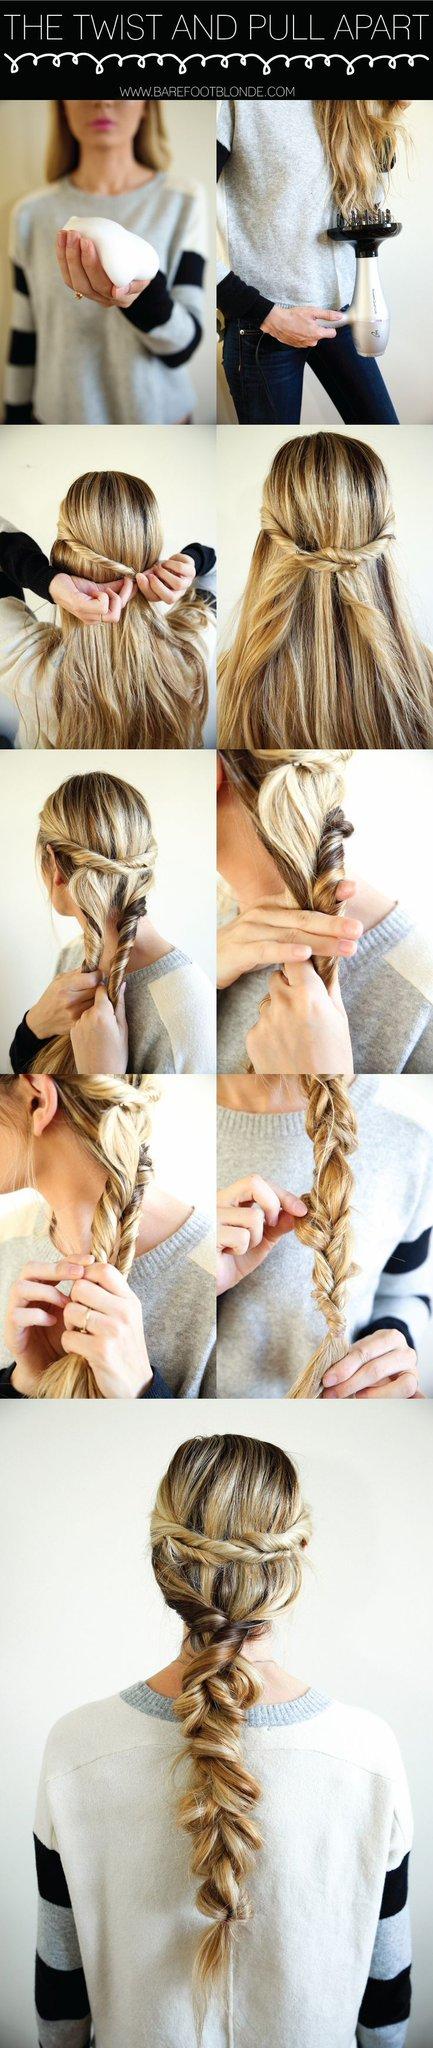 Simplemente hermoso peinado http://t.co/nEdrPX1oAB